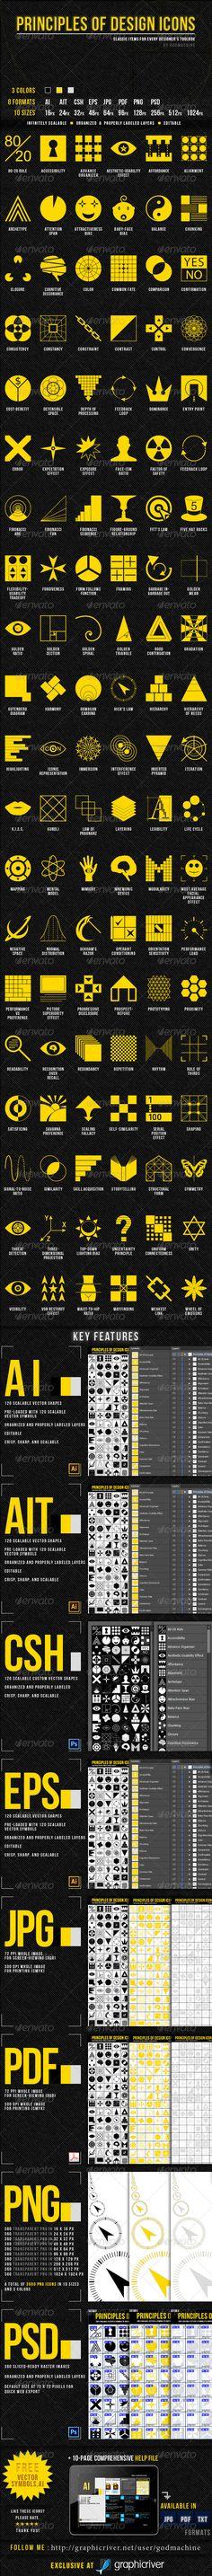 Principles of Design Icons by Godmachine #design #print #web #goldenRatio #sacred